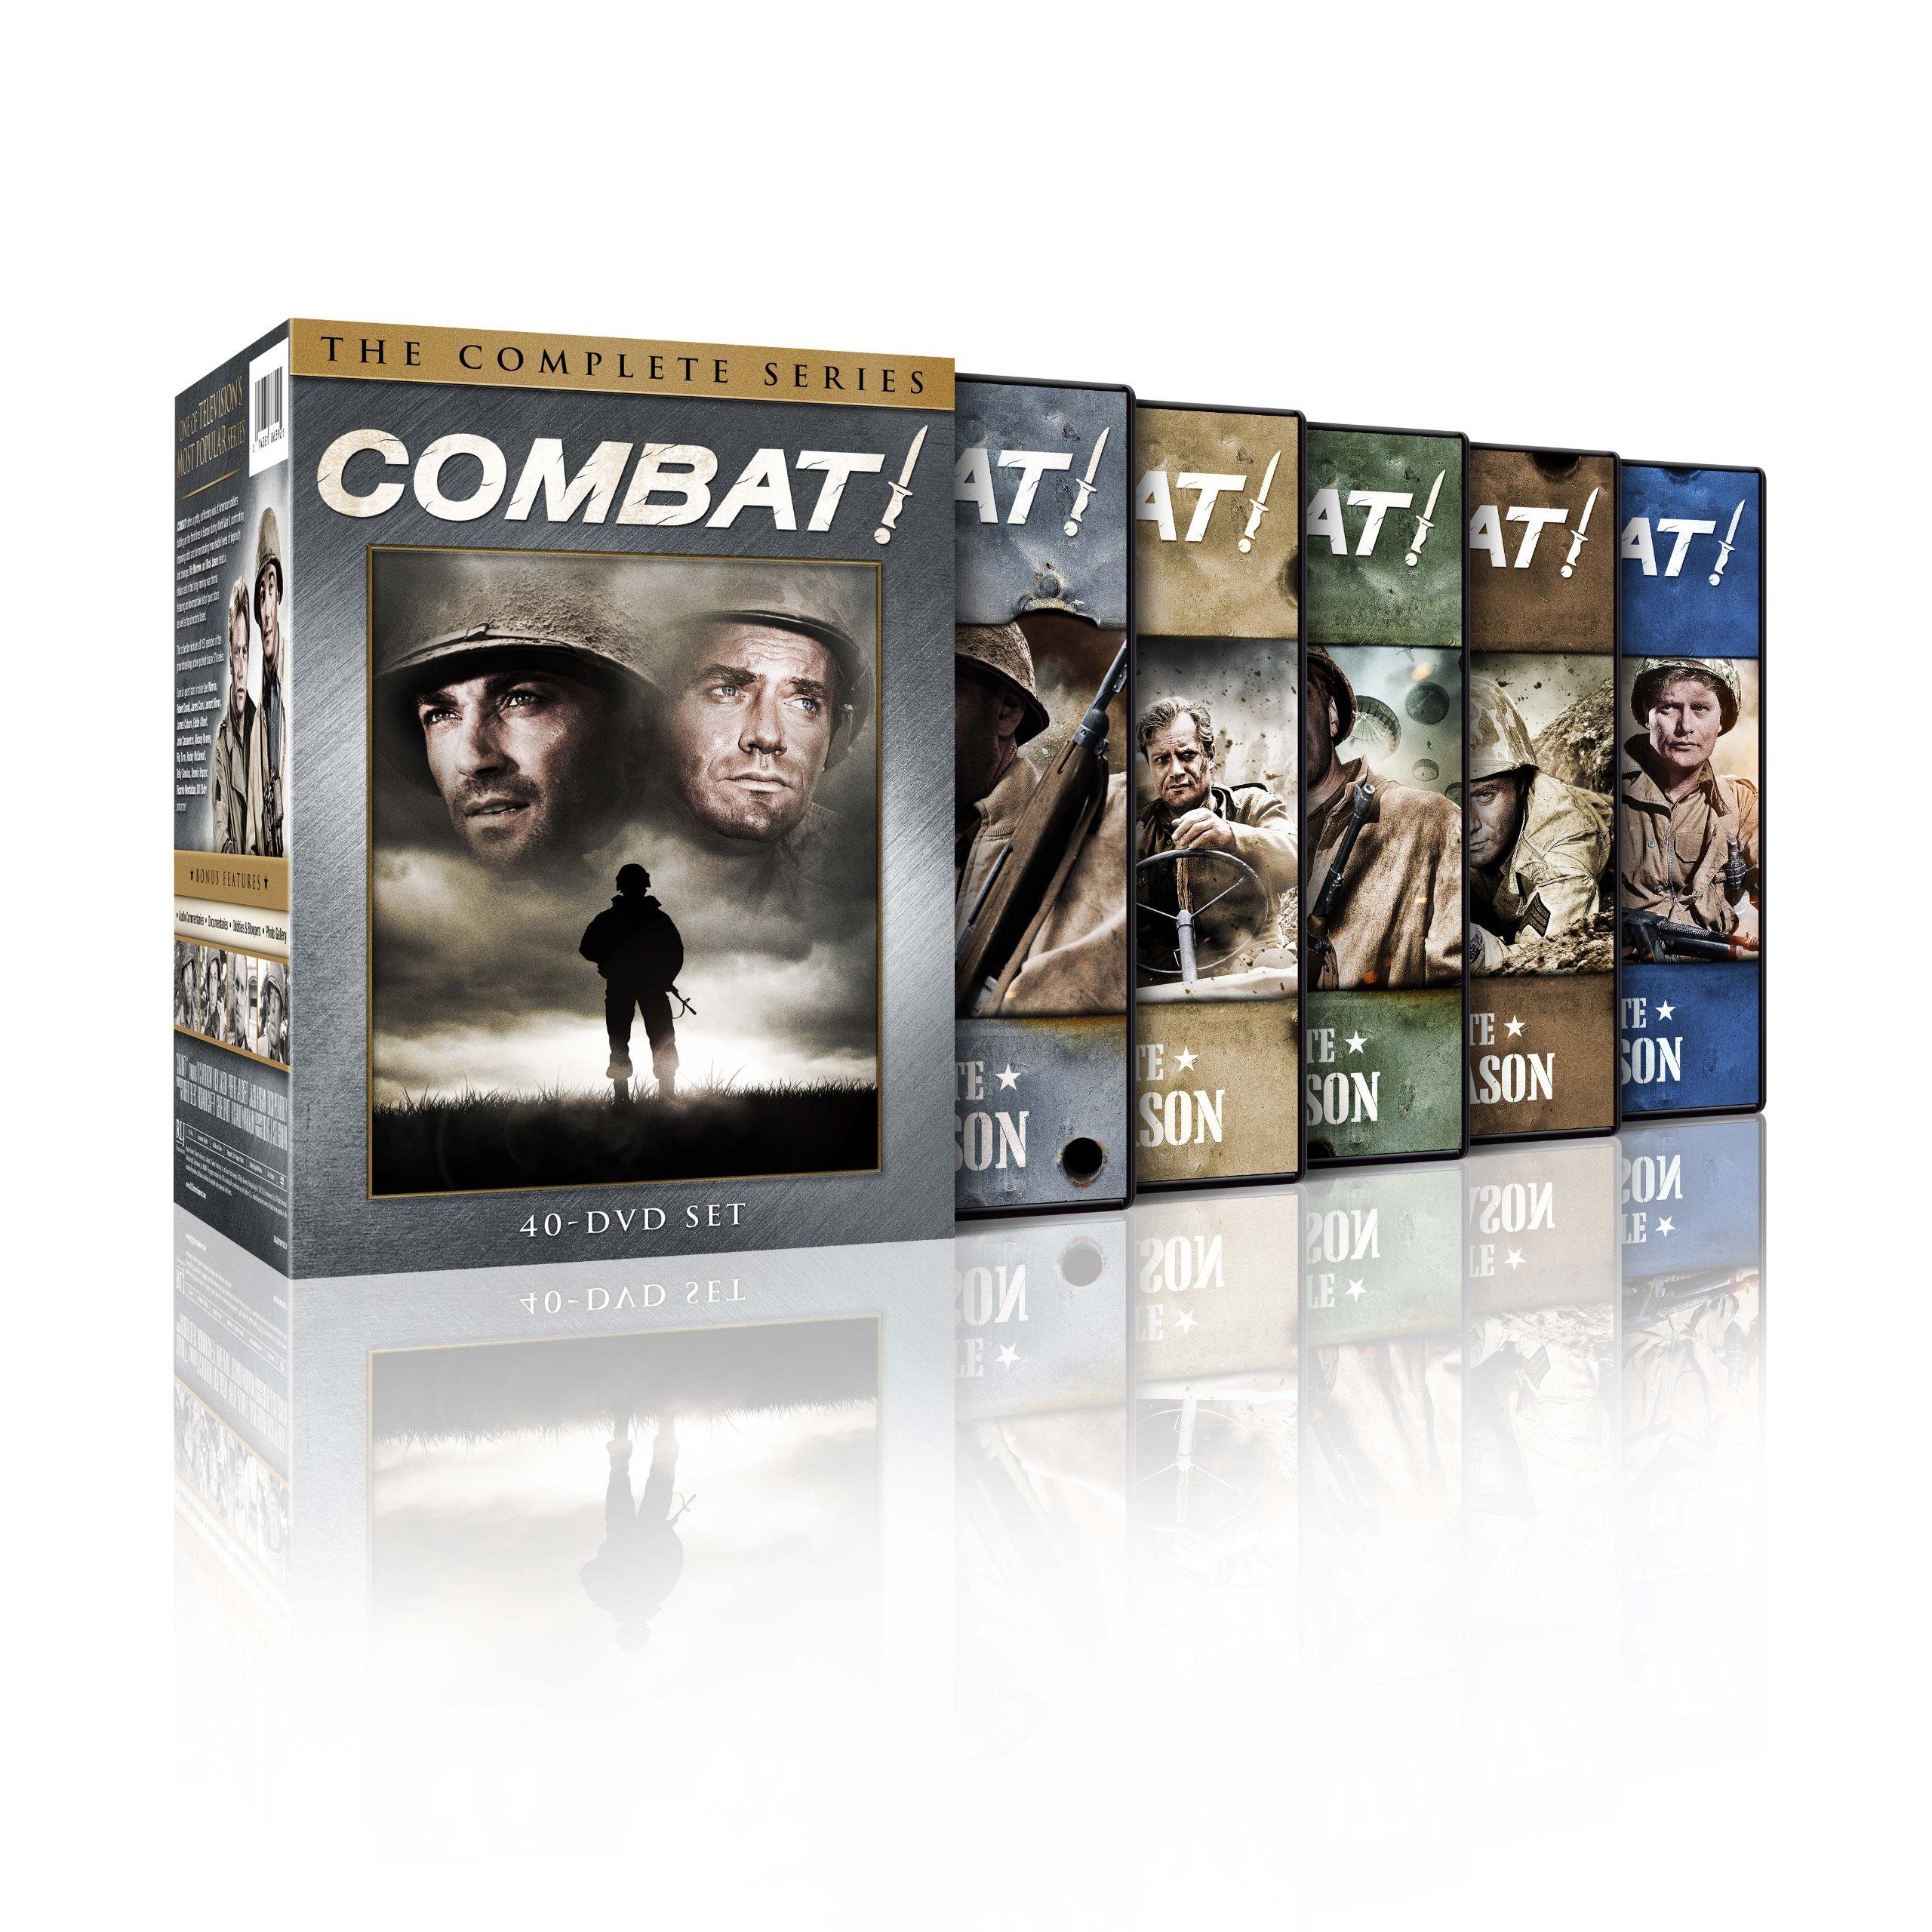 Combat!: The Complete Series